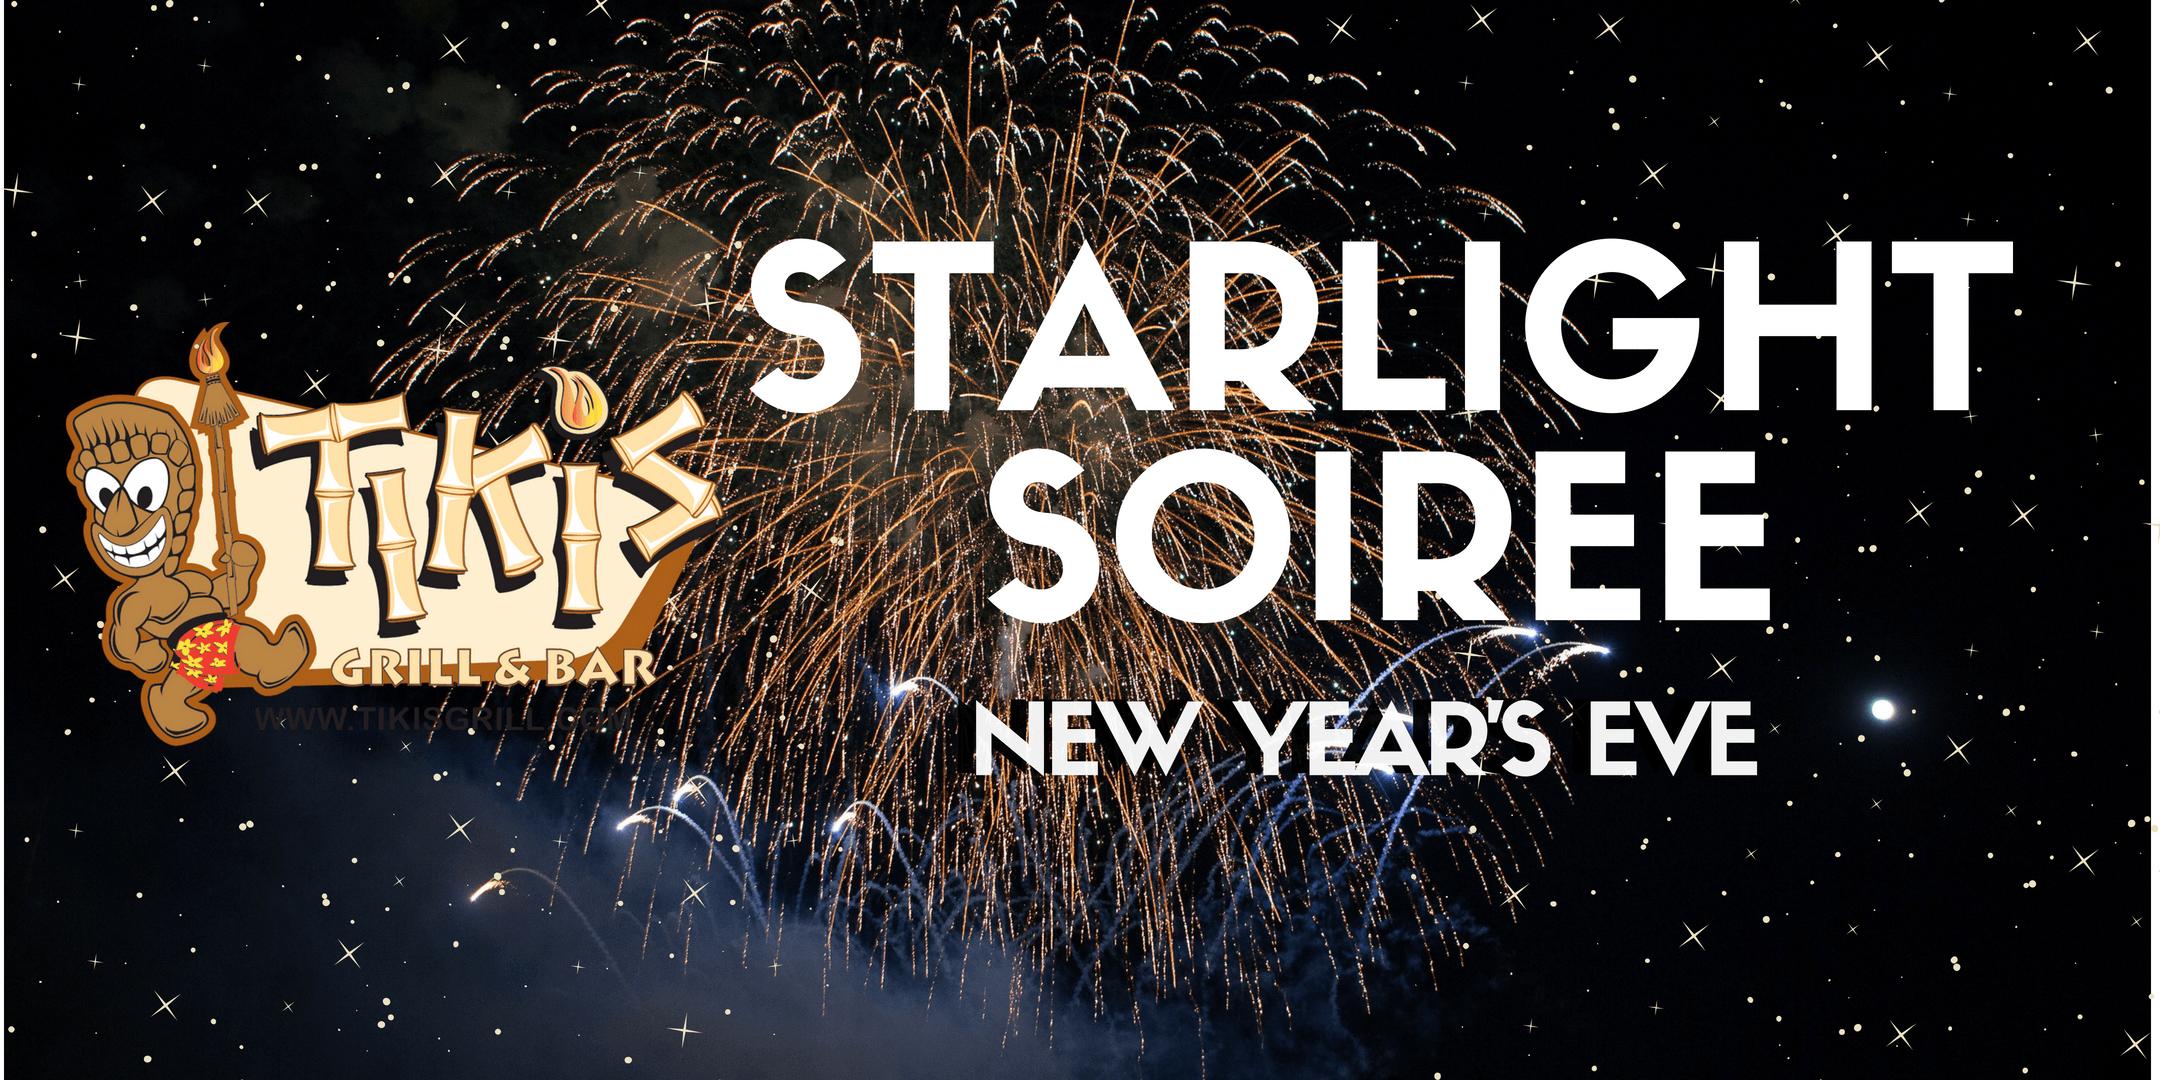 tiki s new year s eve starlight soiree dinner party tiki s grill